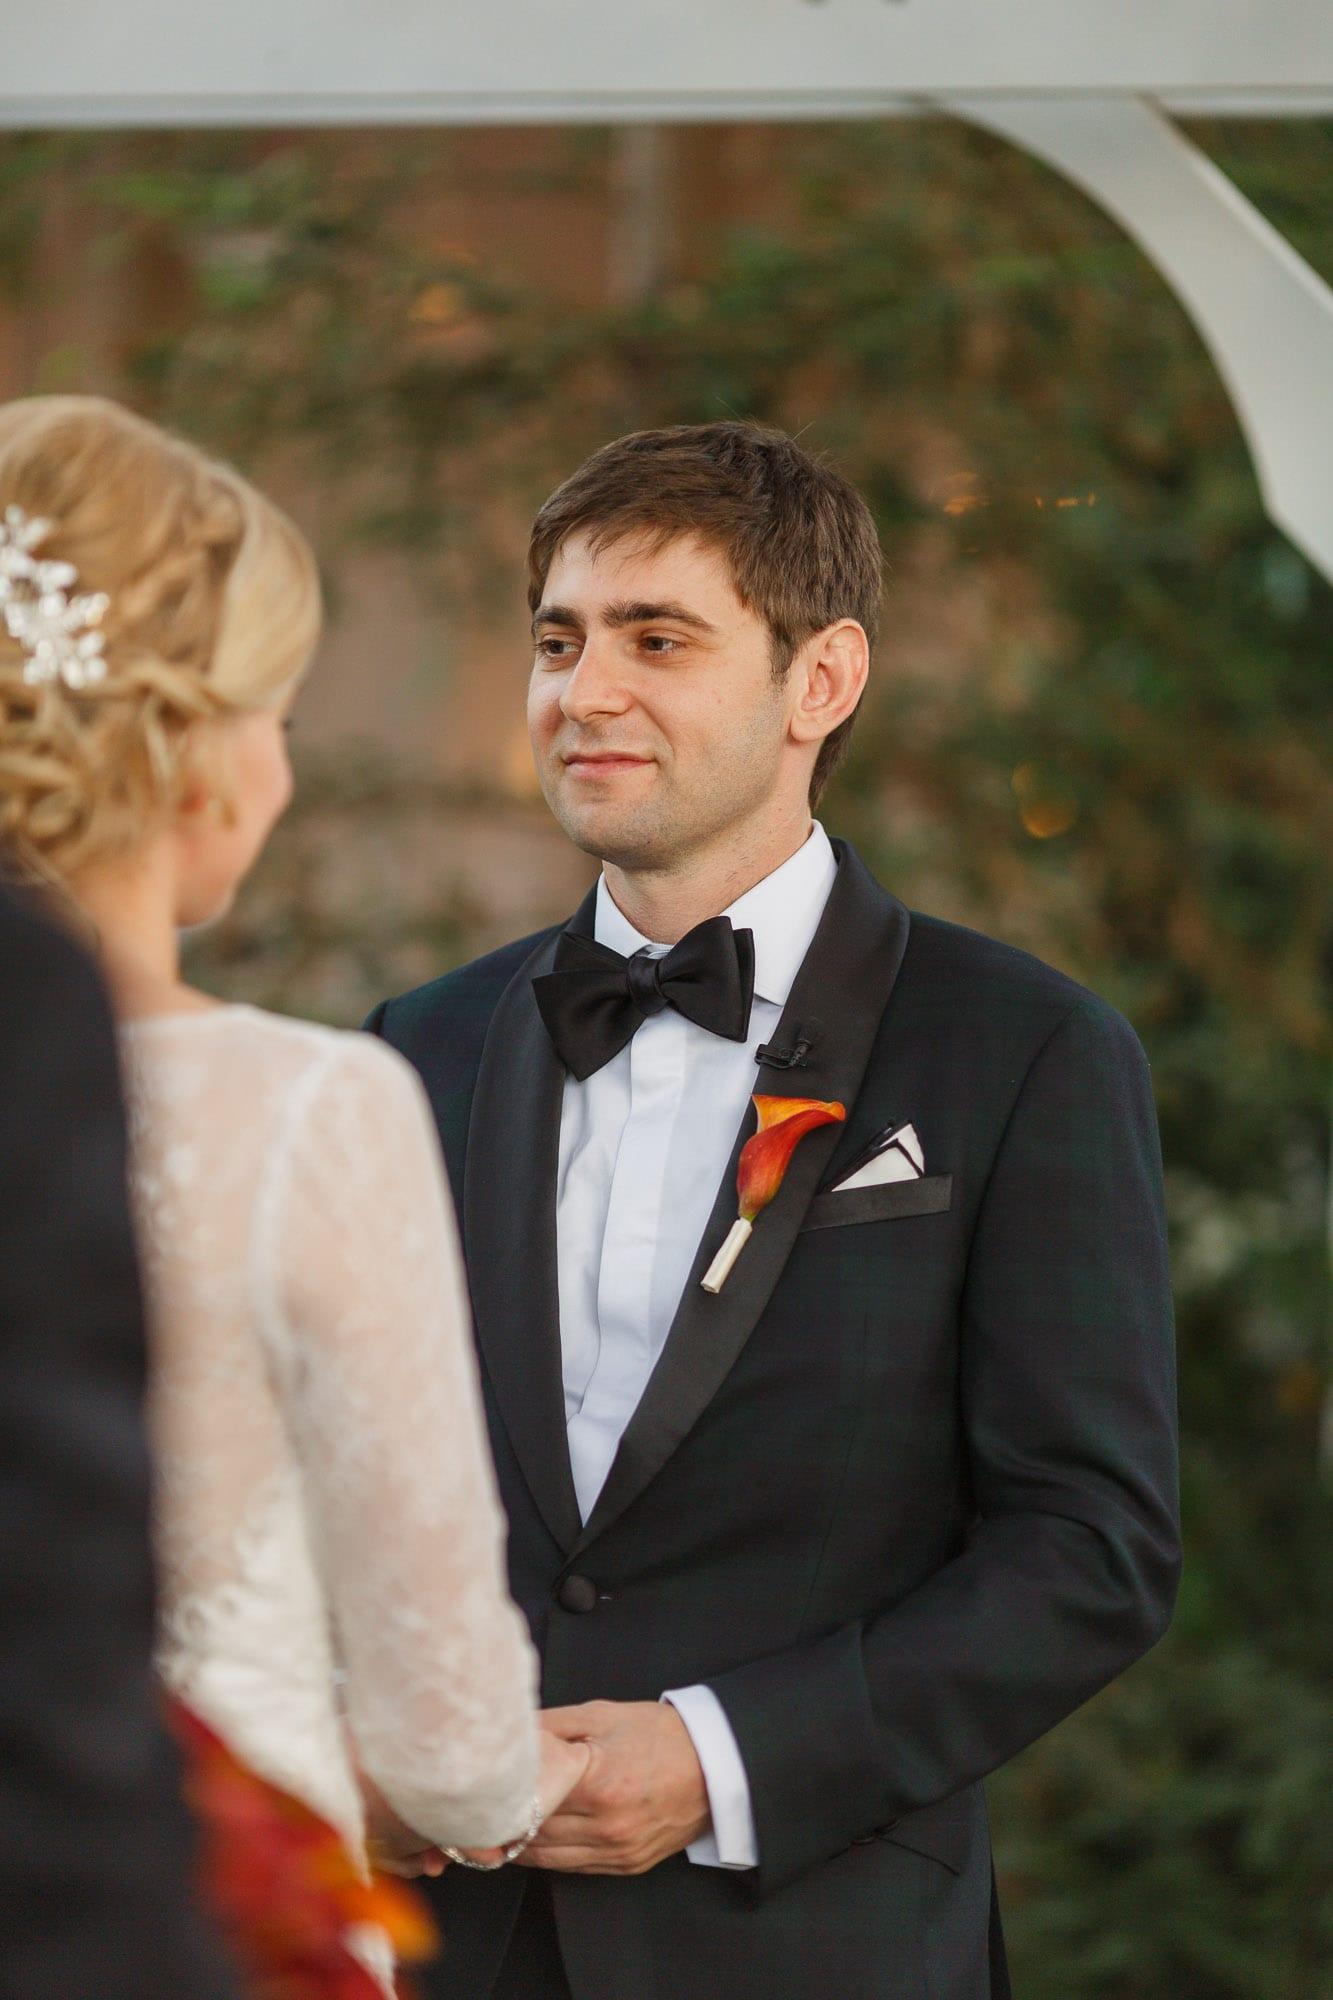 048_Alan_and_Heidi_Los_Angeles_Equestrian_Center_Wedding